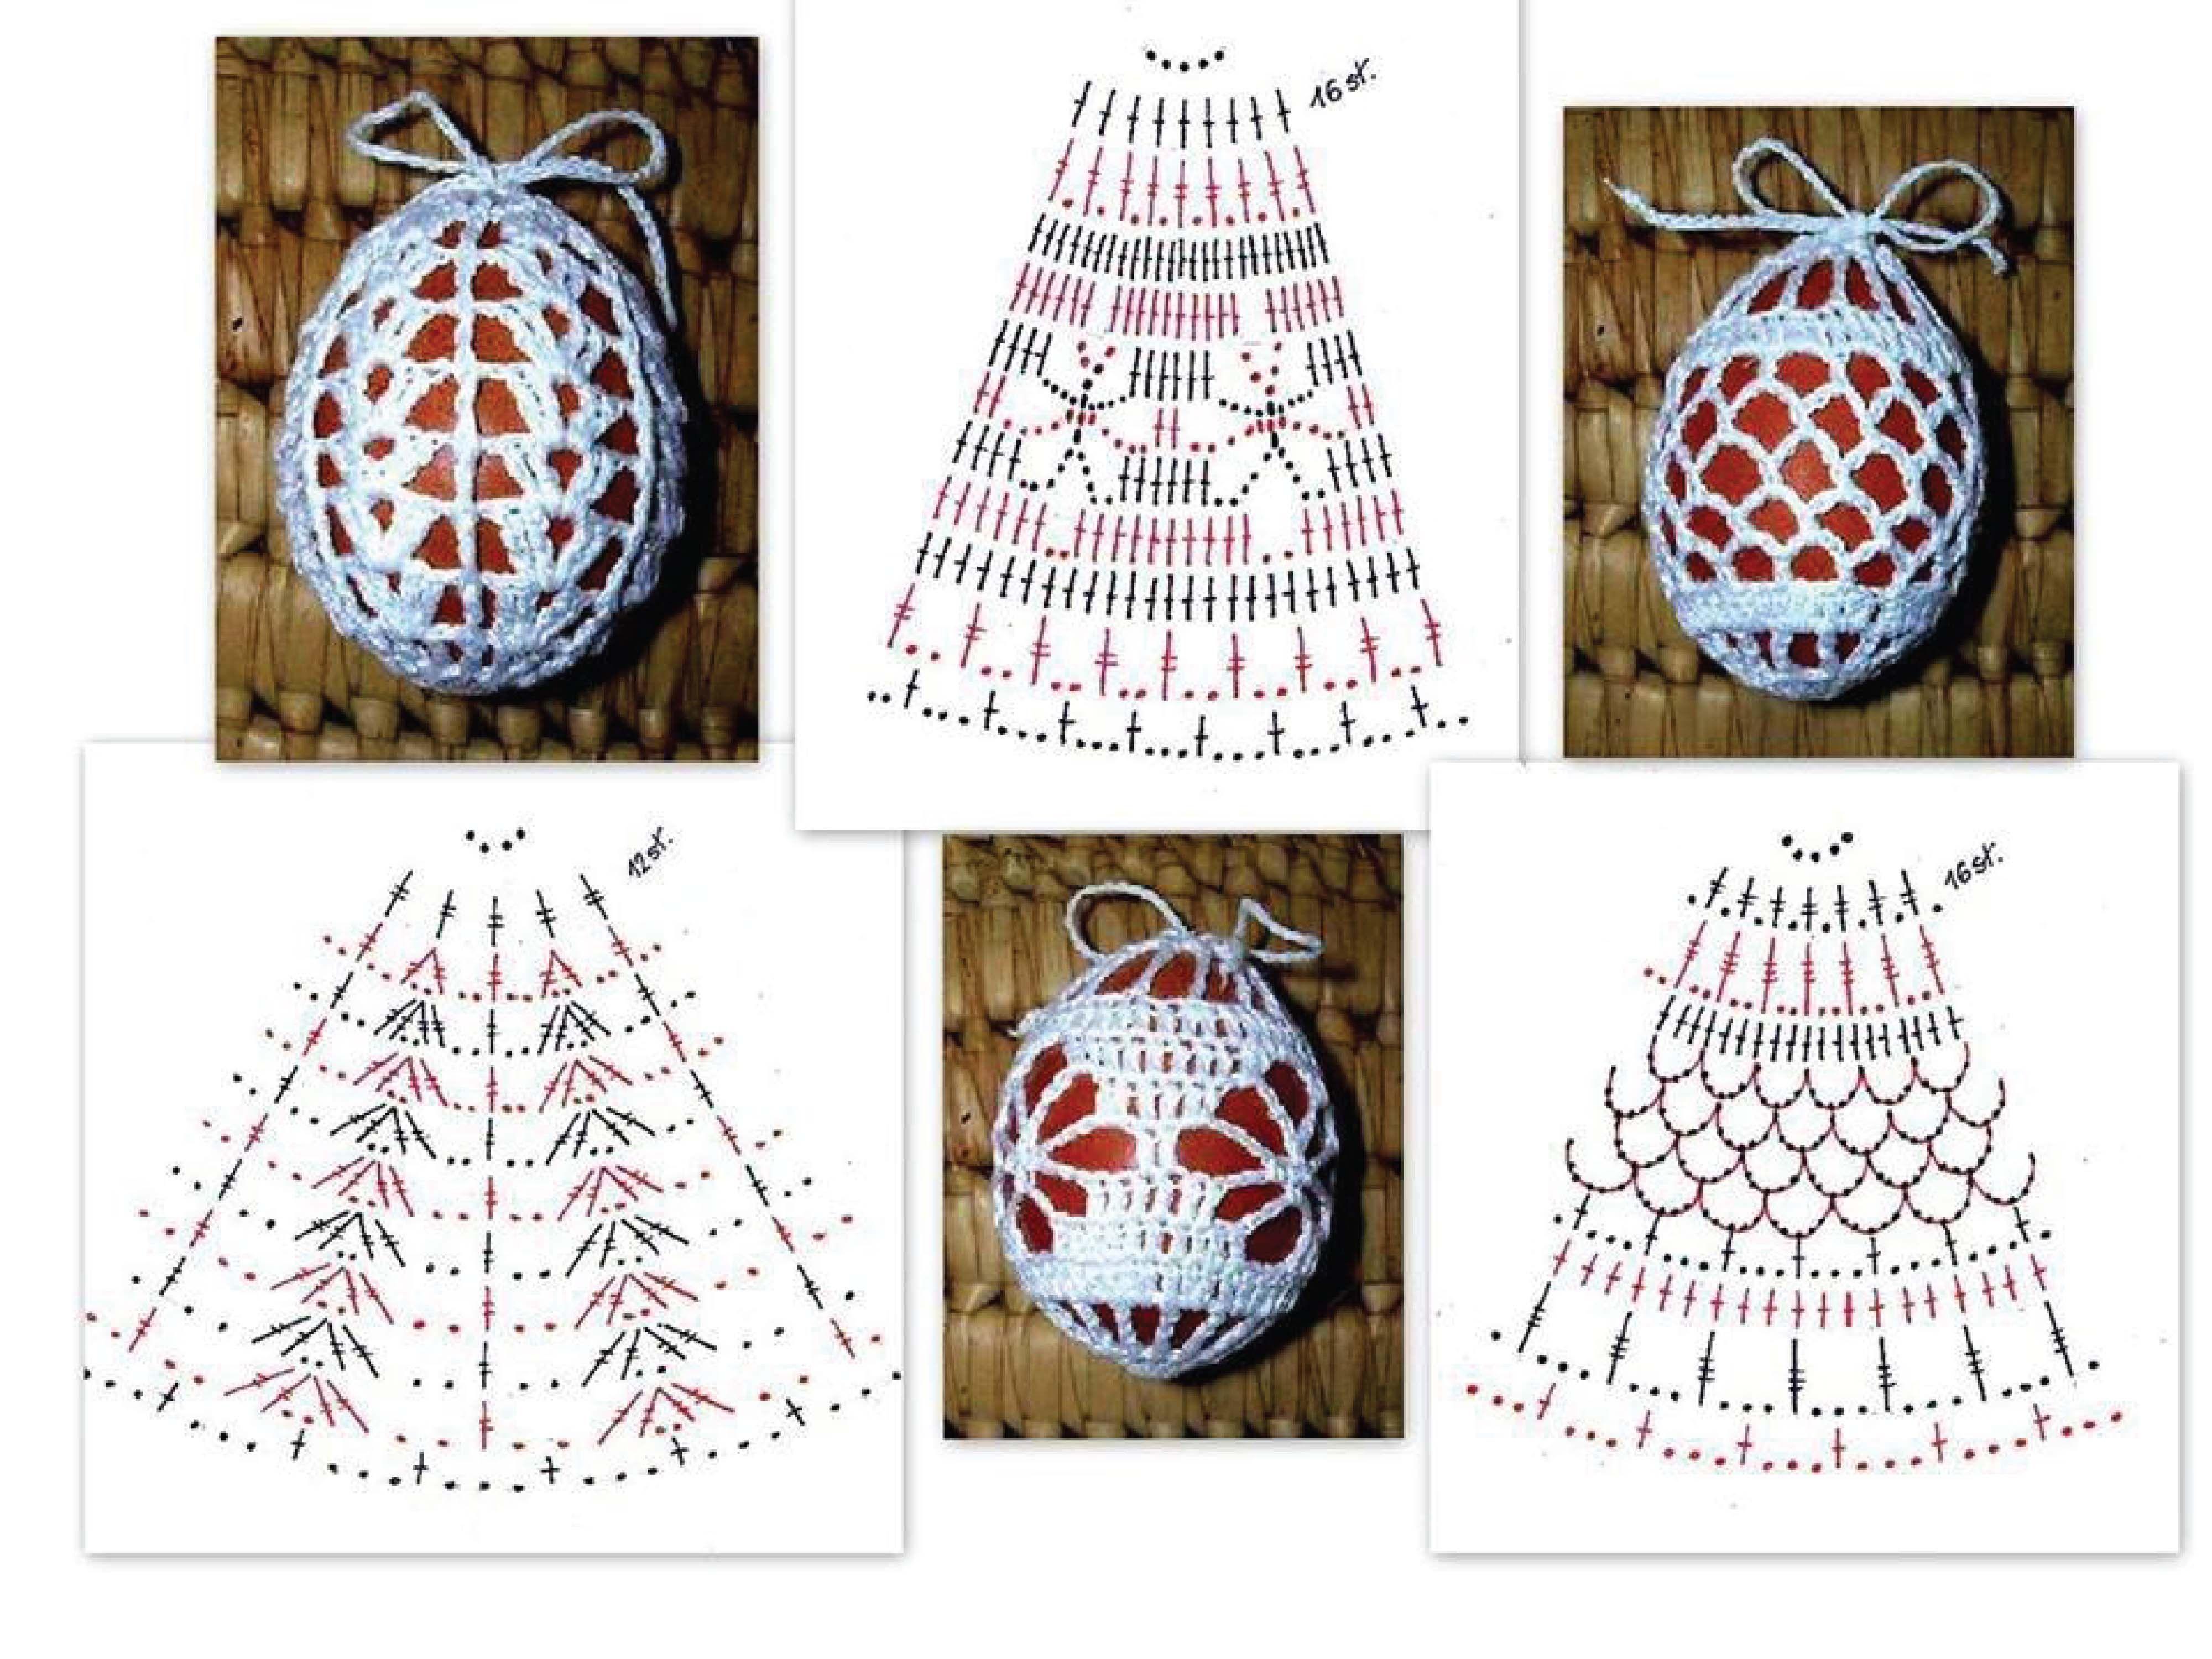 pascua | crochet, patrones gratis | Pinterest | Crochet patrones ...